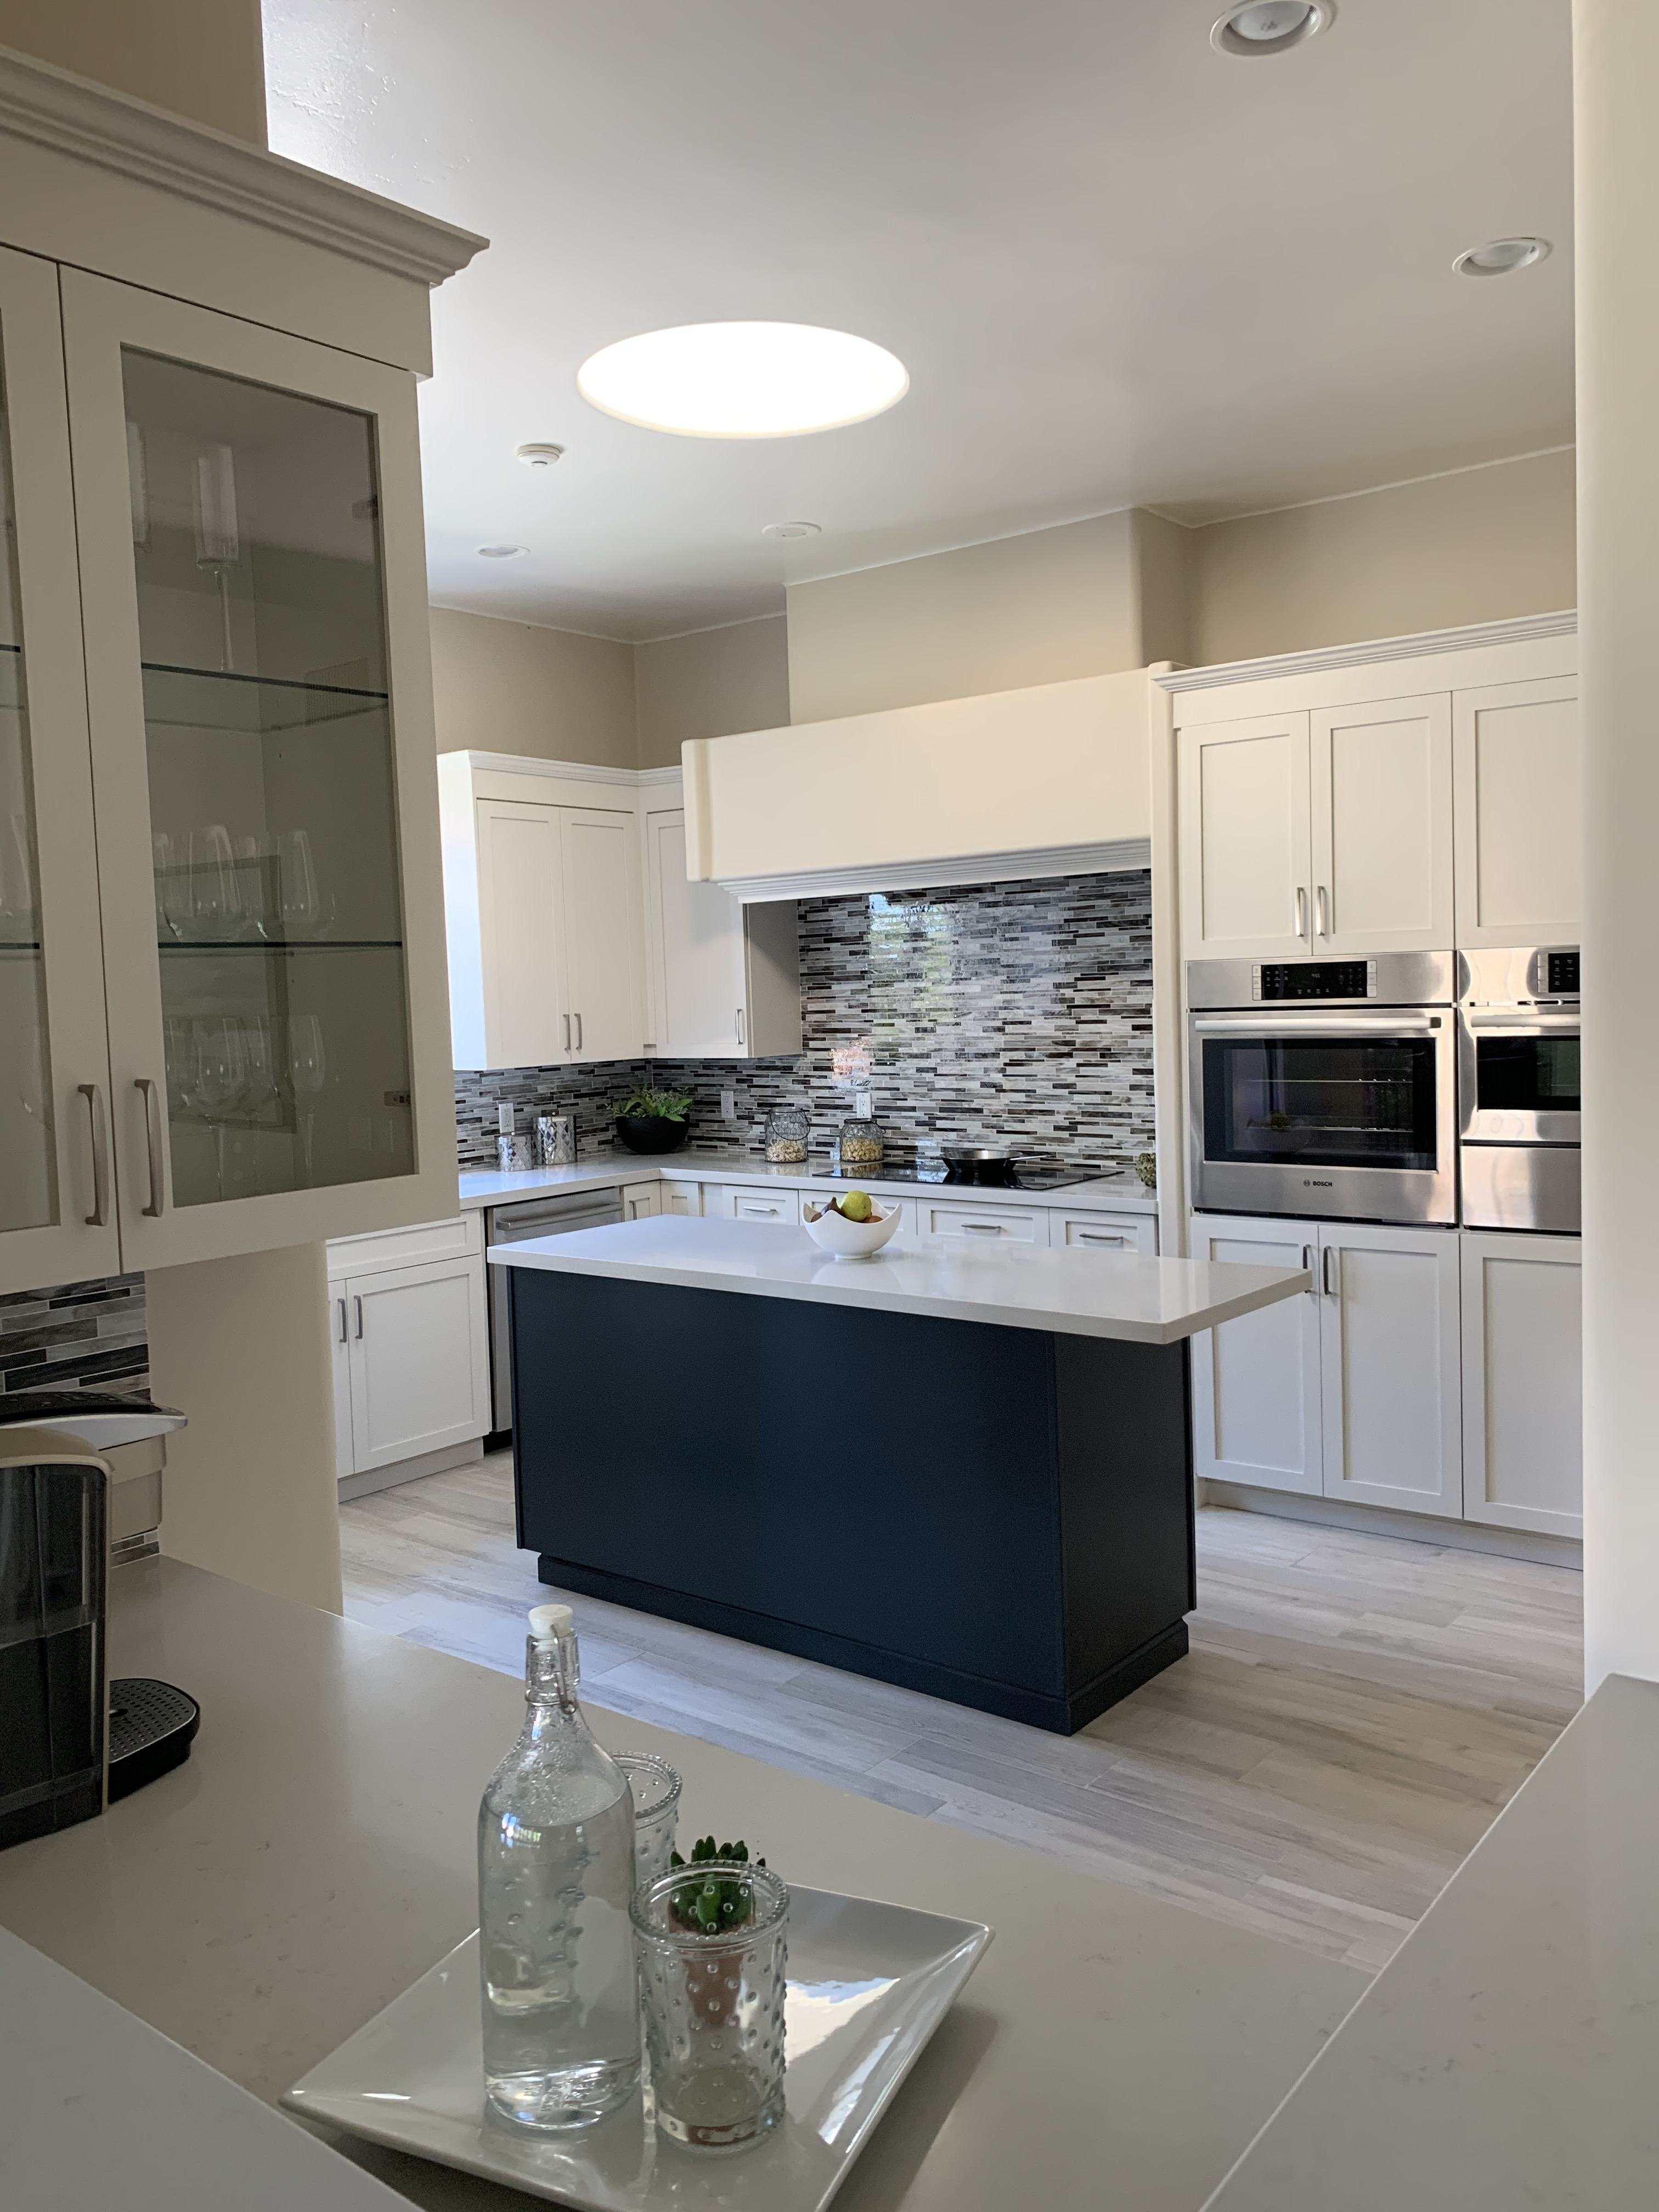 Miller Rancho Santa Fe Cabinet Refacing - Boyars Kitchen ...